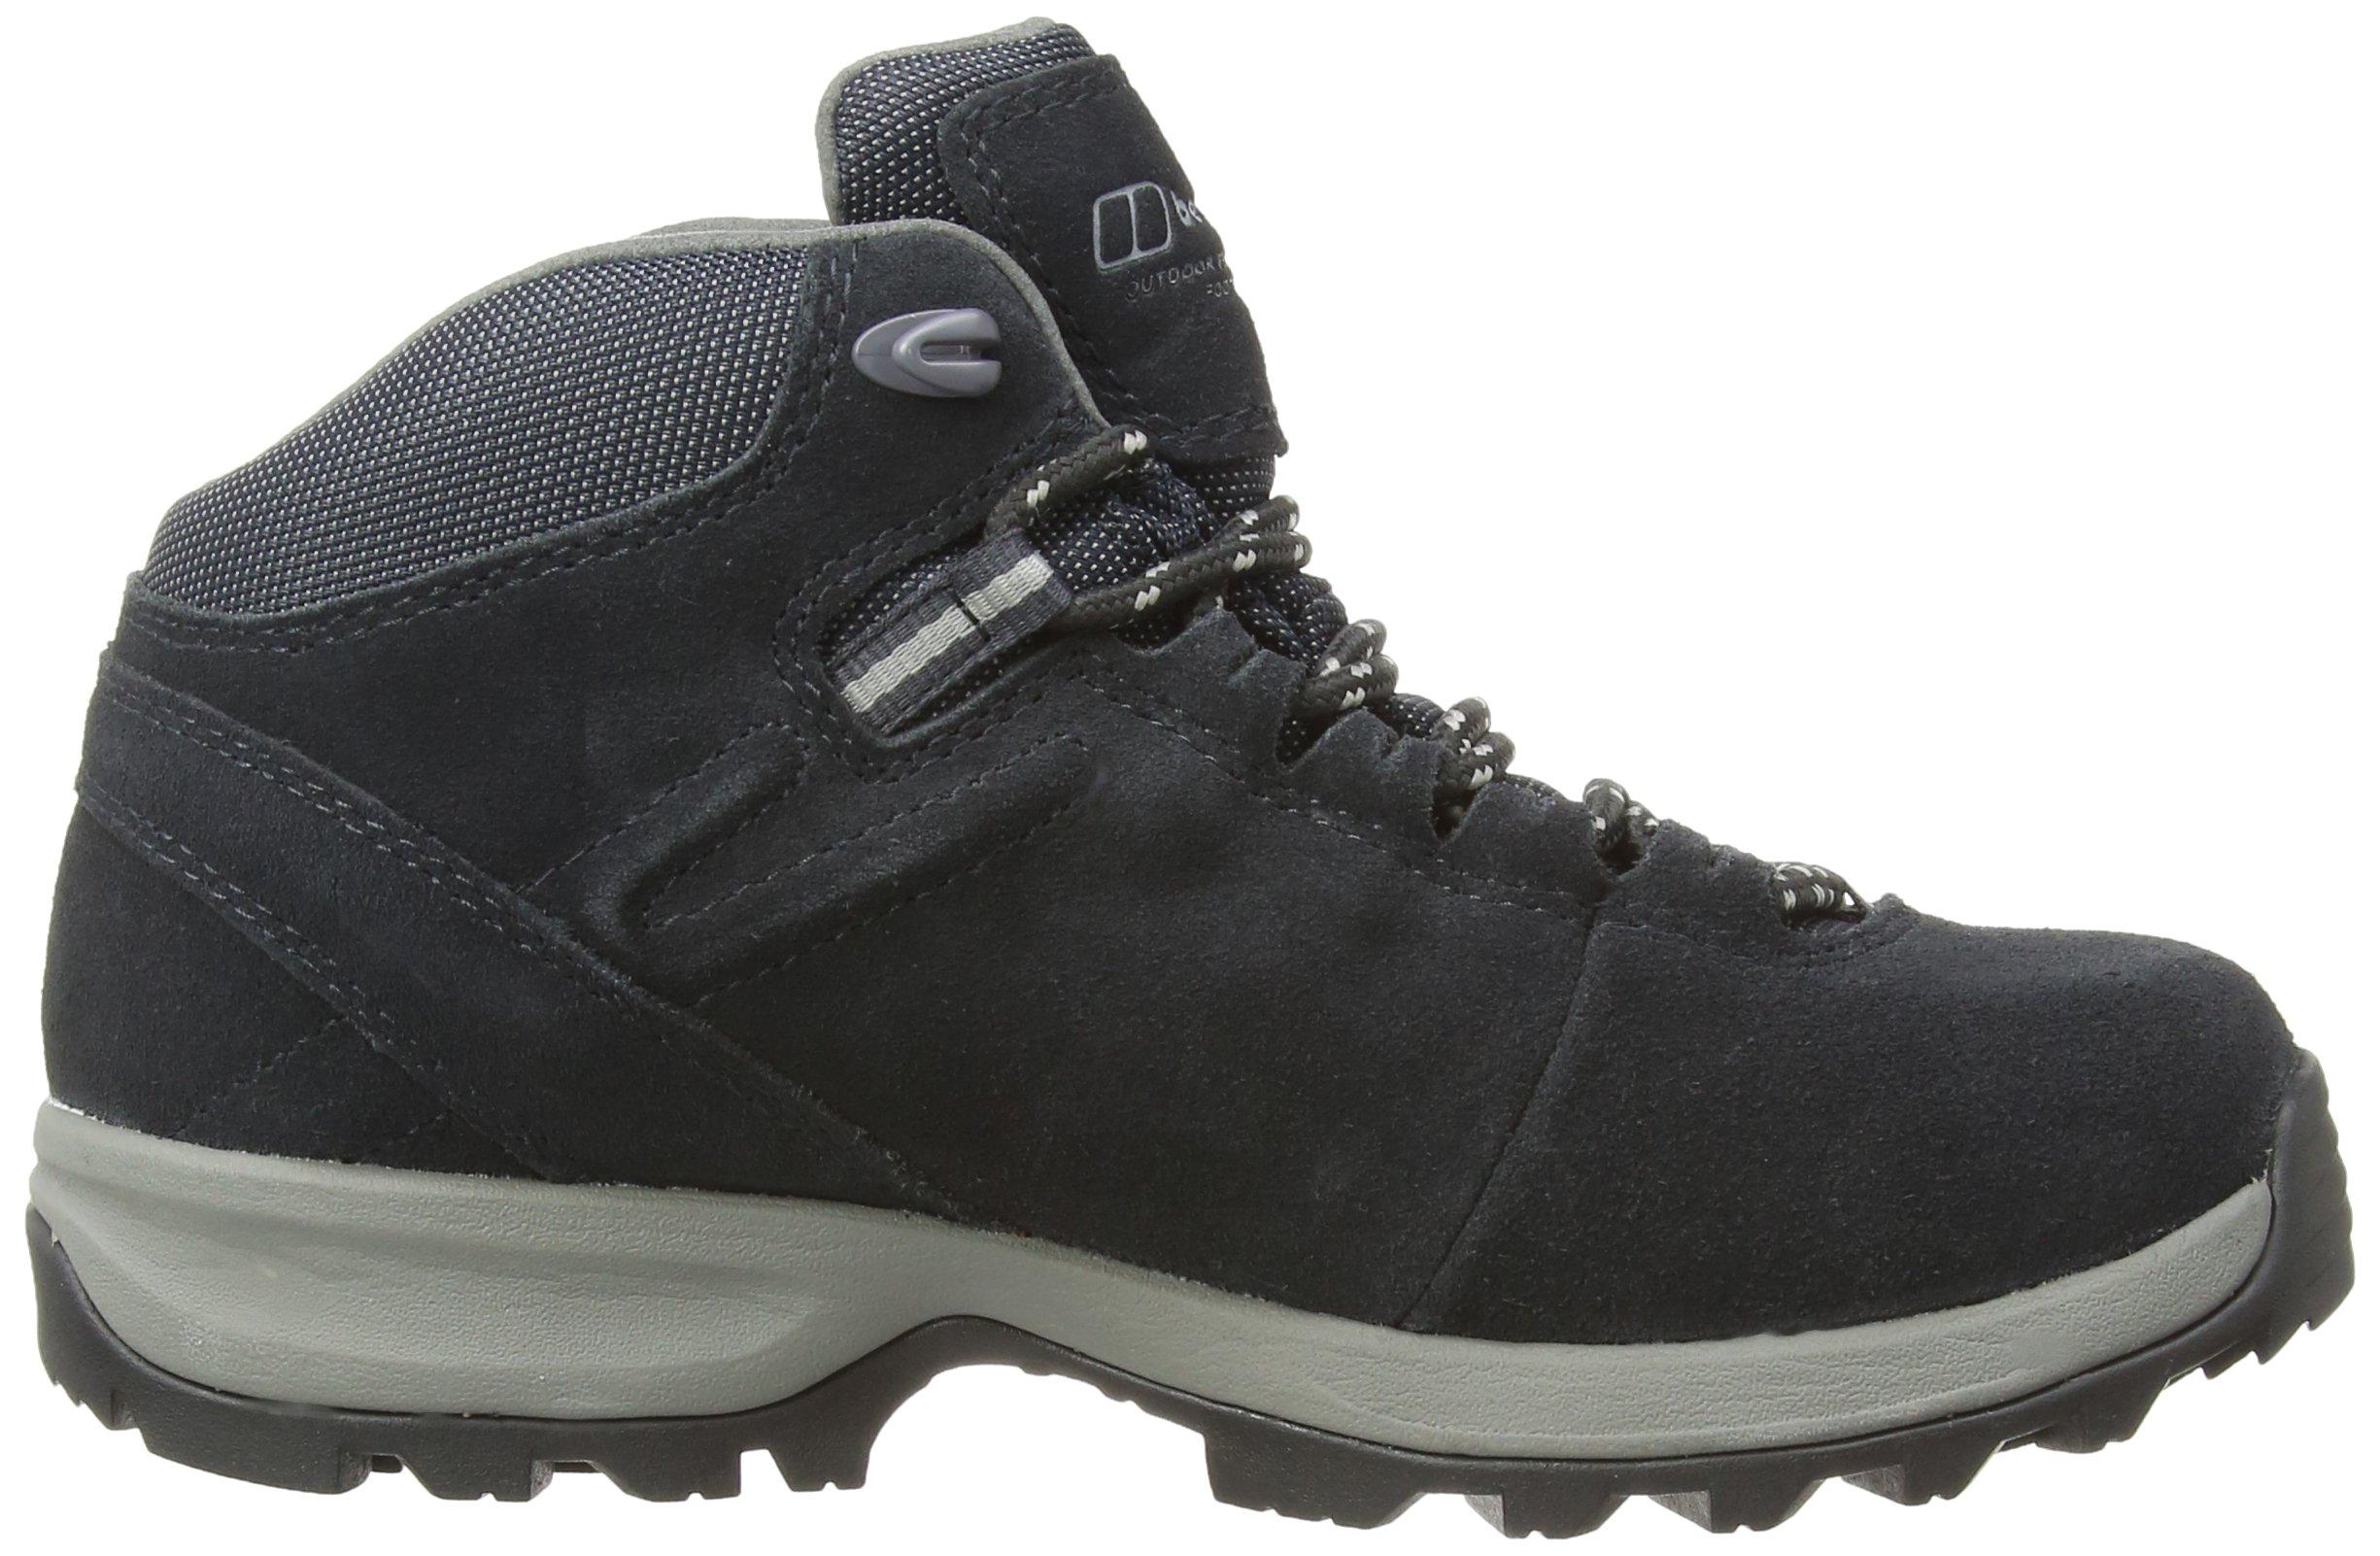 Berghaus Women's Explorer Trail Plus GTX Walking Boots 6